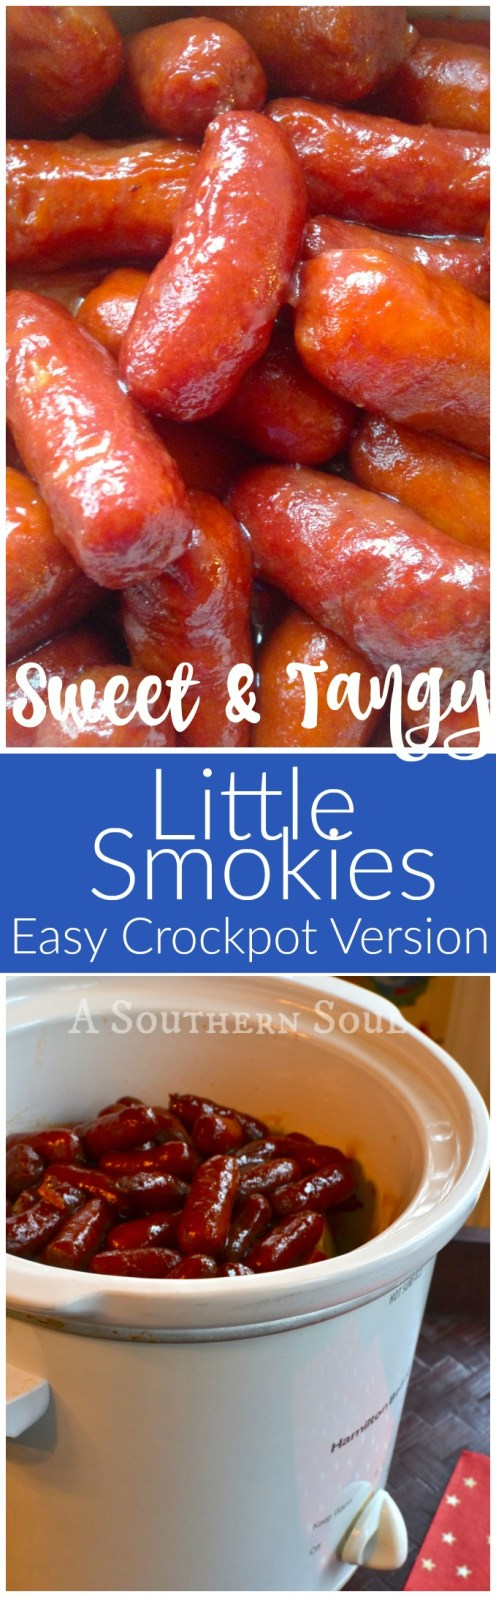 Little smokies made in the crock pot